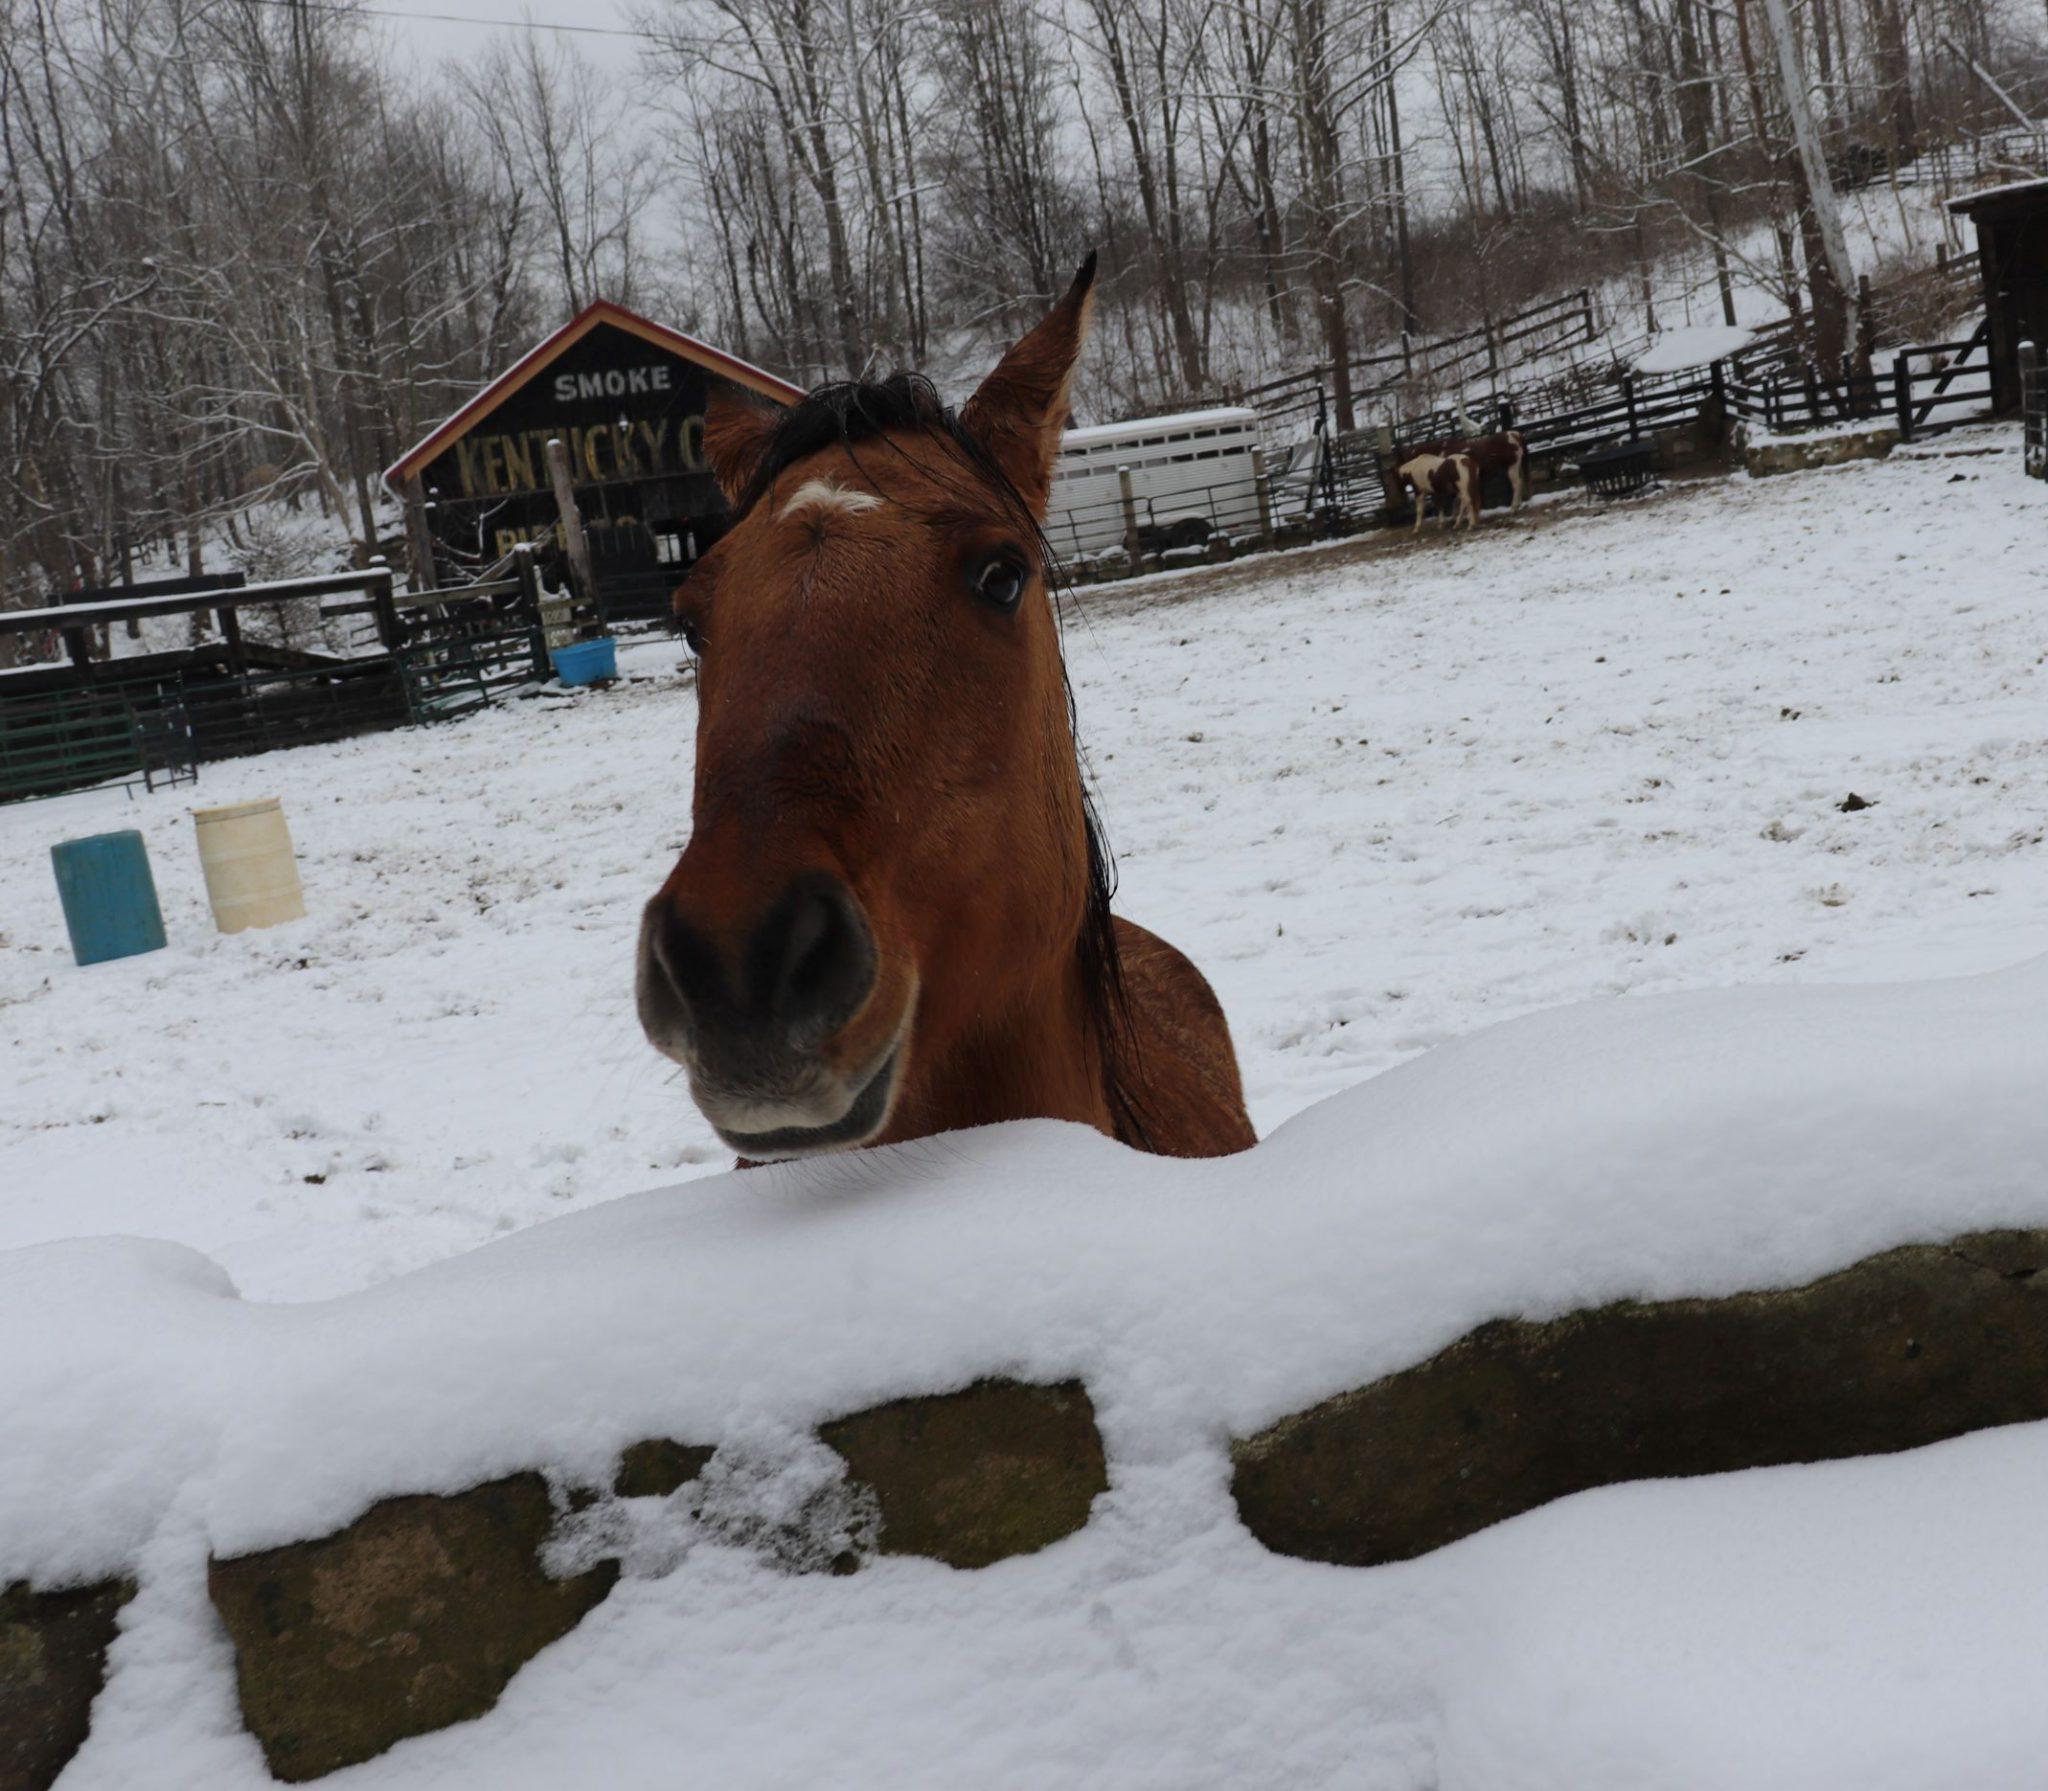 Horse Adoption Polices